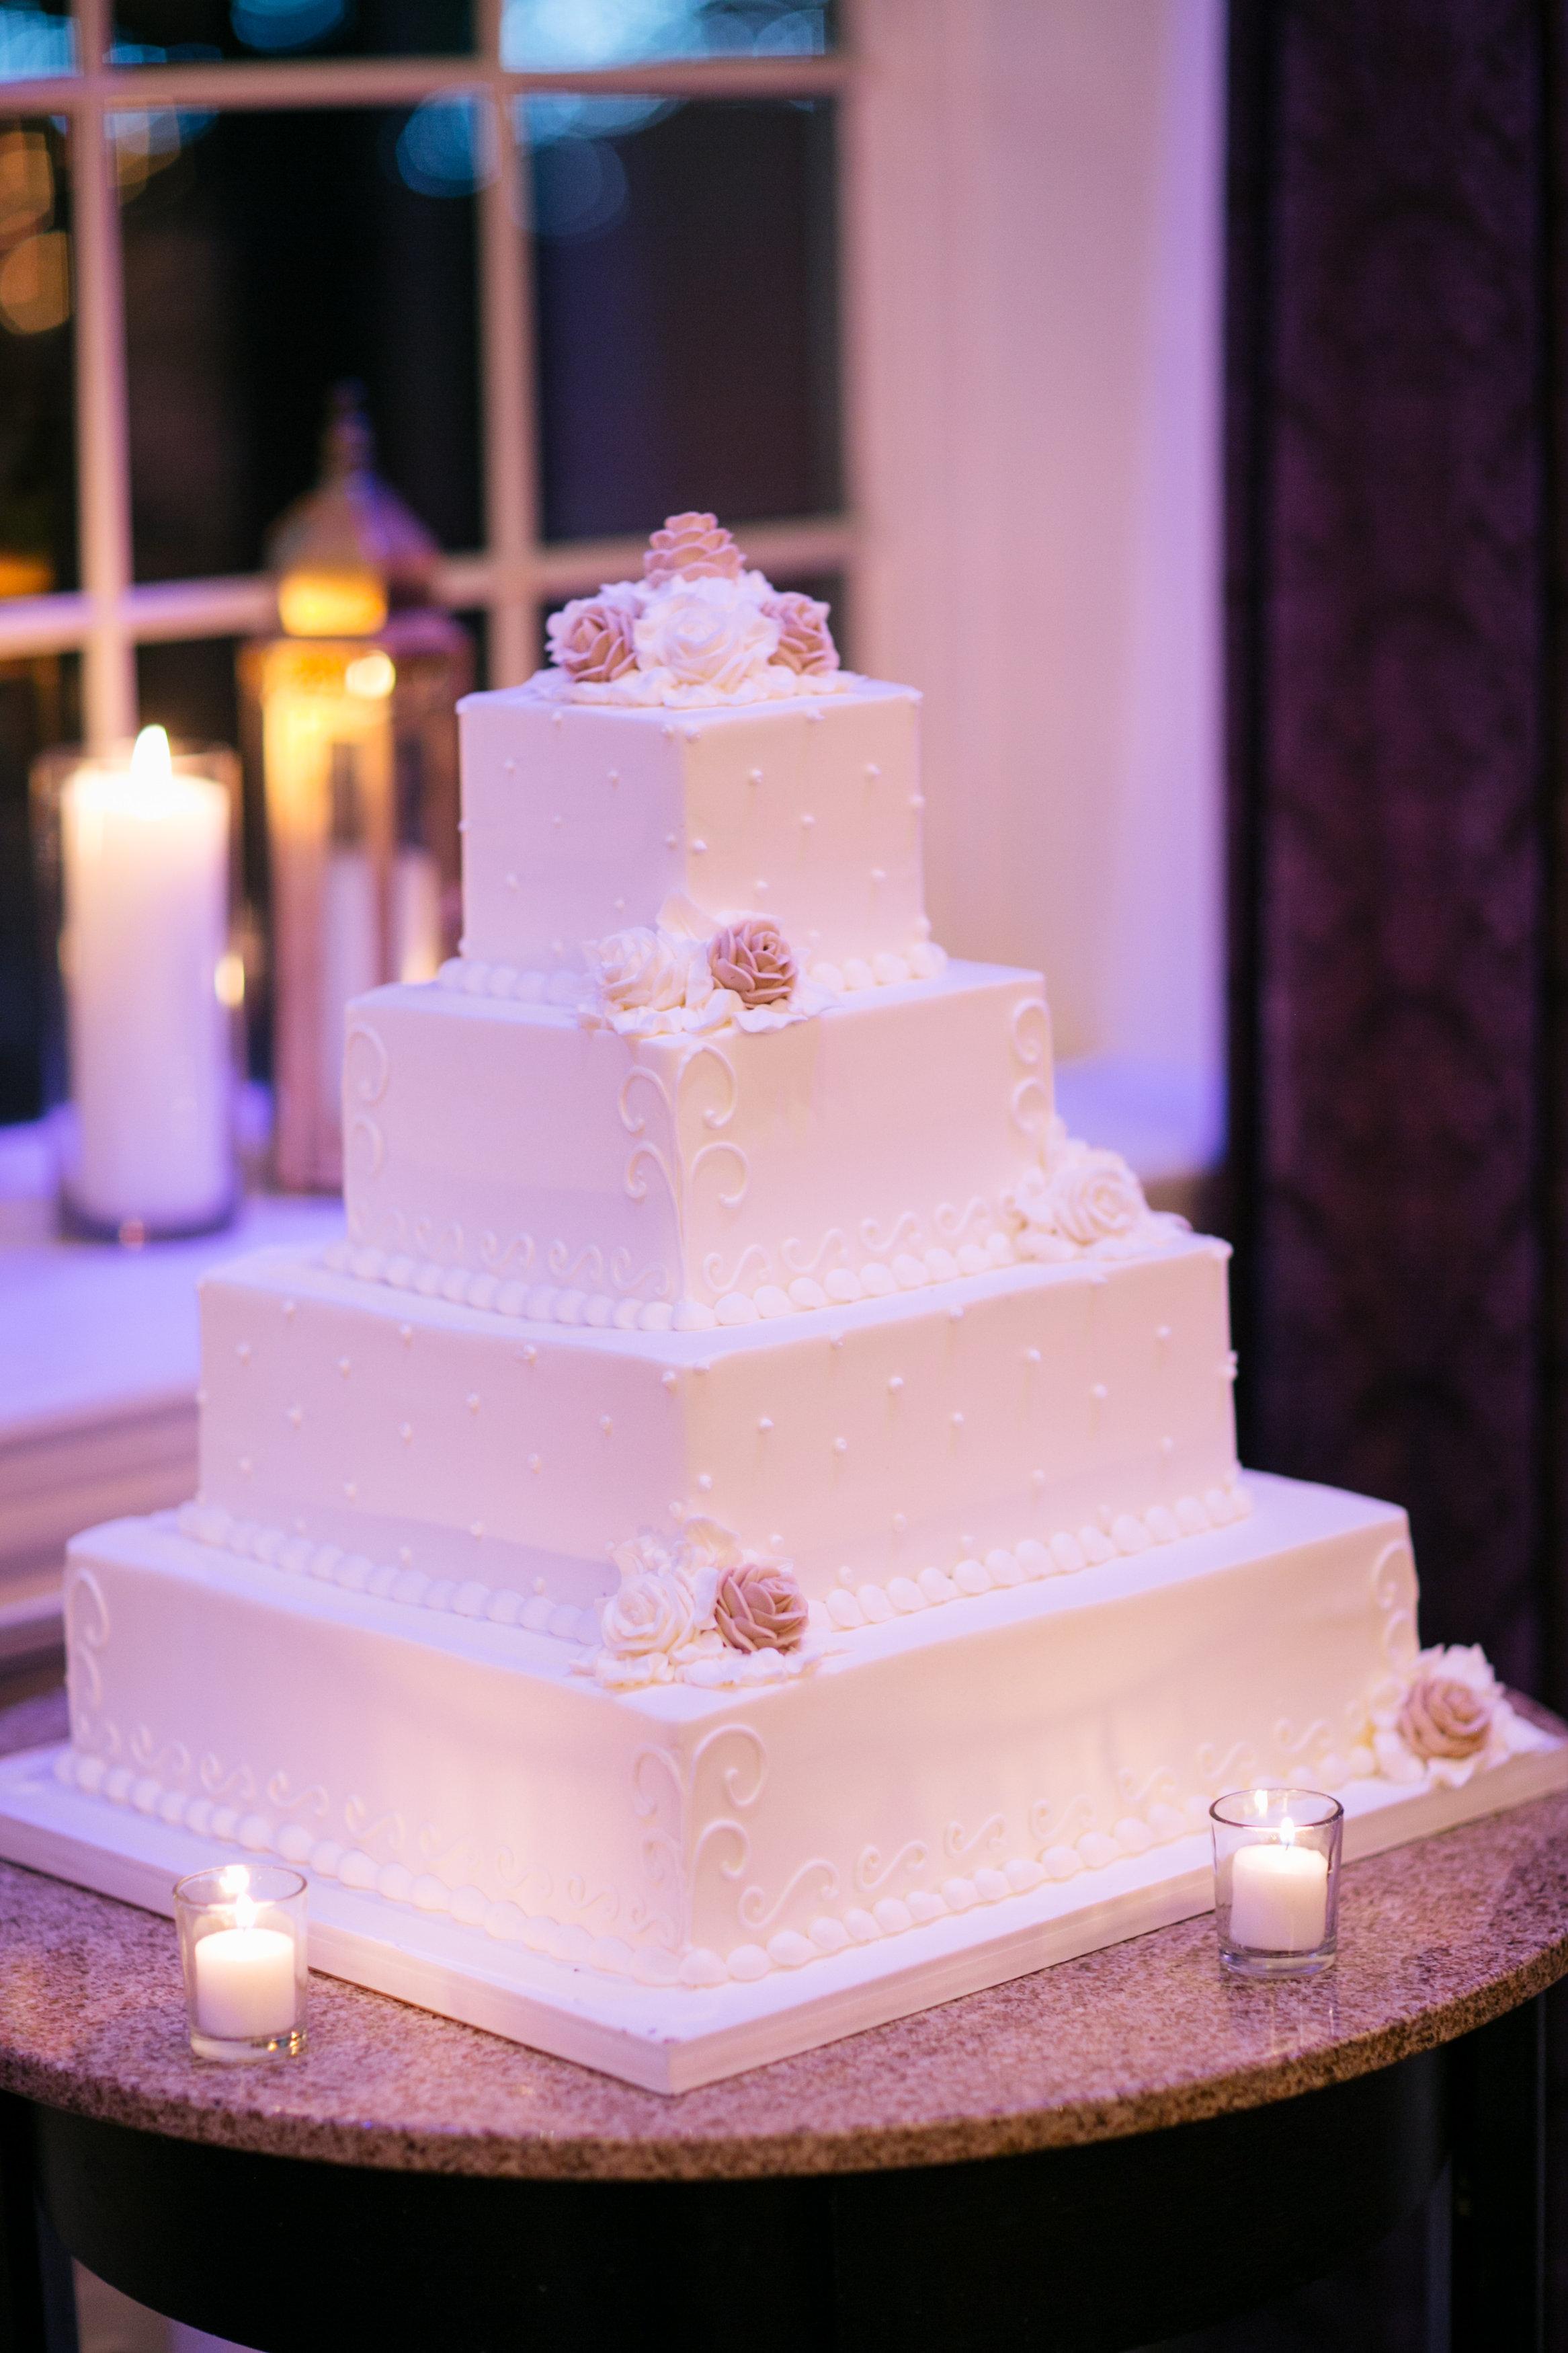 Ceci_New_York_Custom_Invitation_ New_Jersey_Wedding_Luxury_Personalized_Ceci_Style_Bride_Foil_Stamping59.jpg